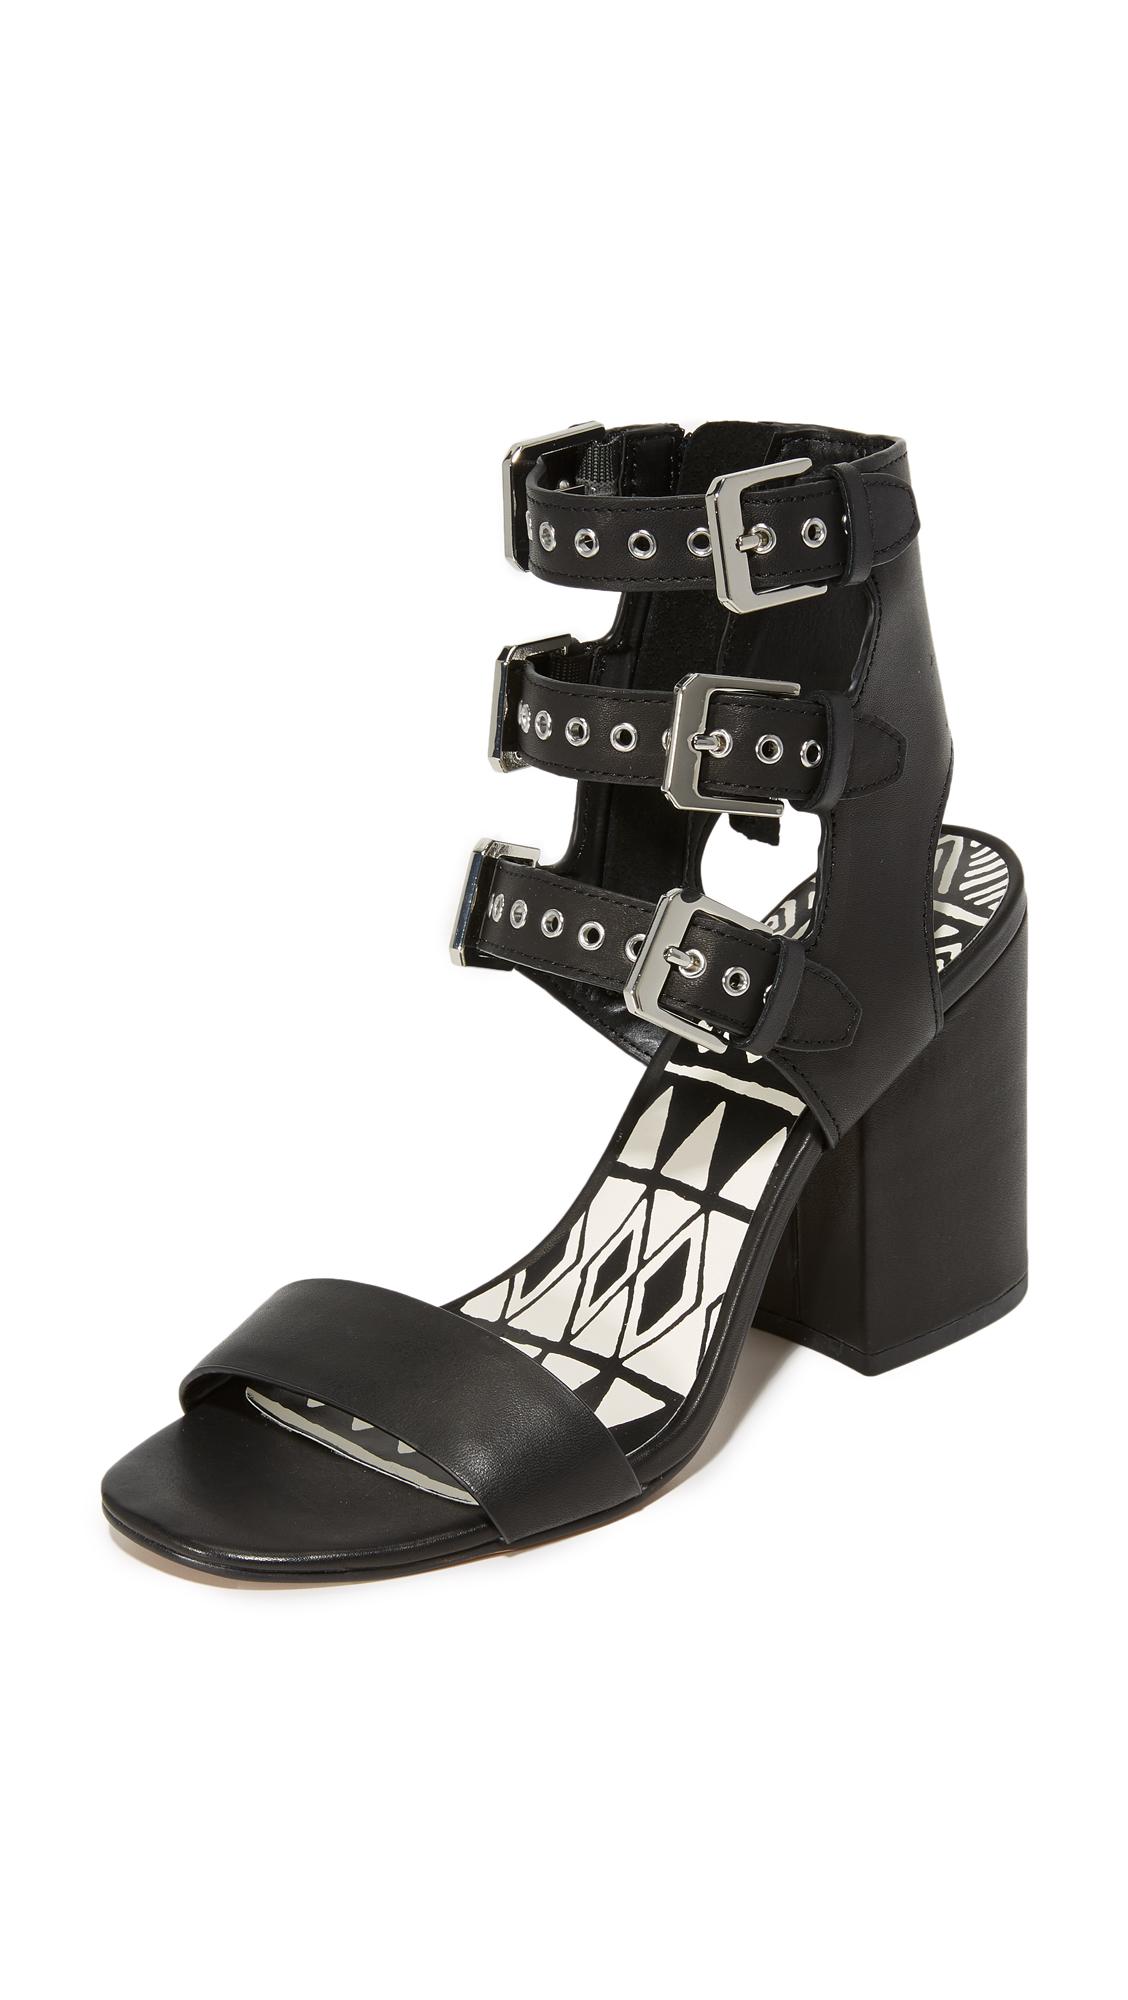 Dolce Vita Edin Block Heel Sandals - Black at Shopbop